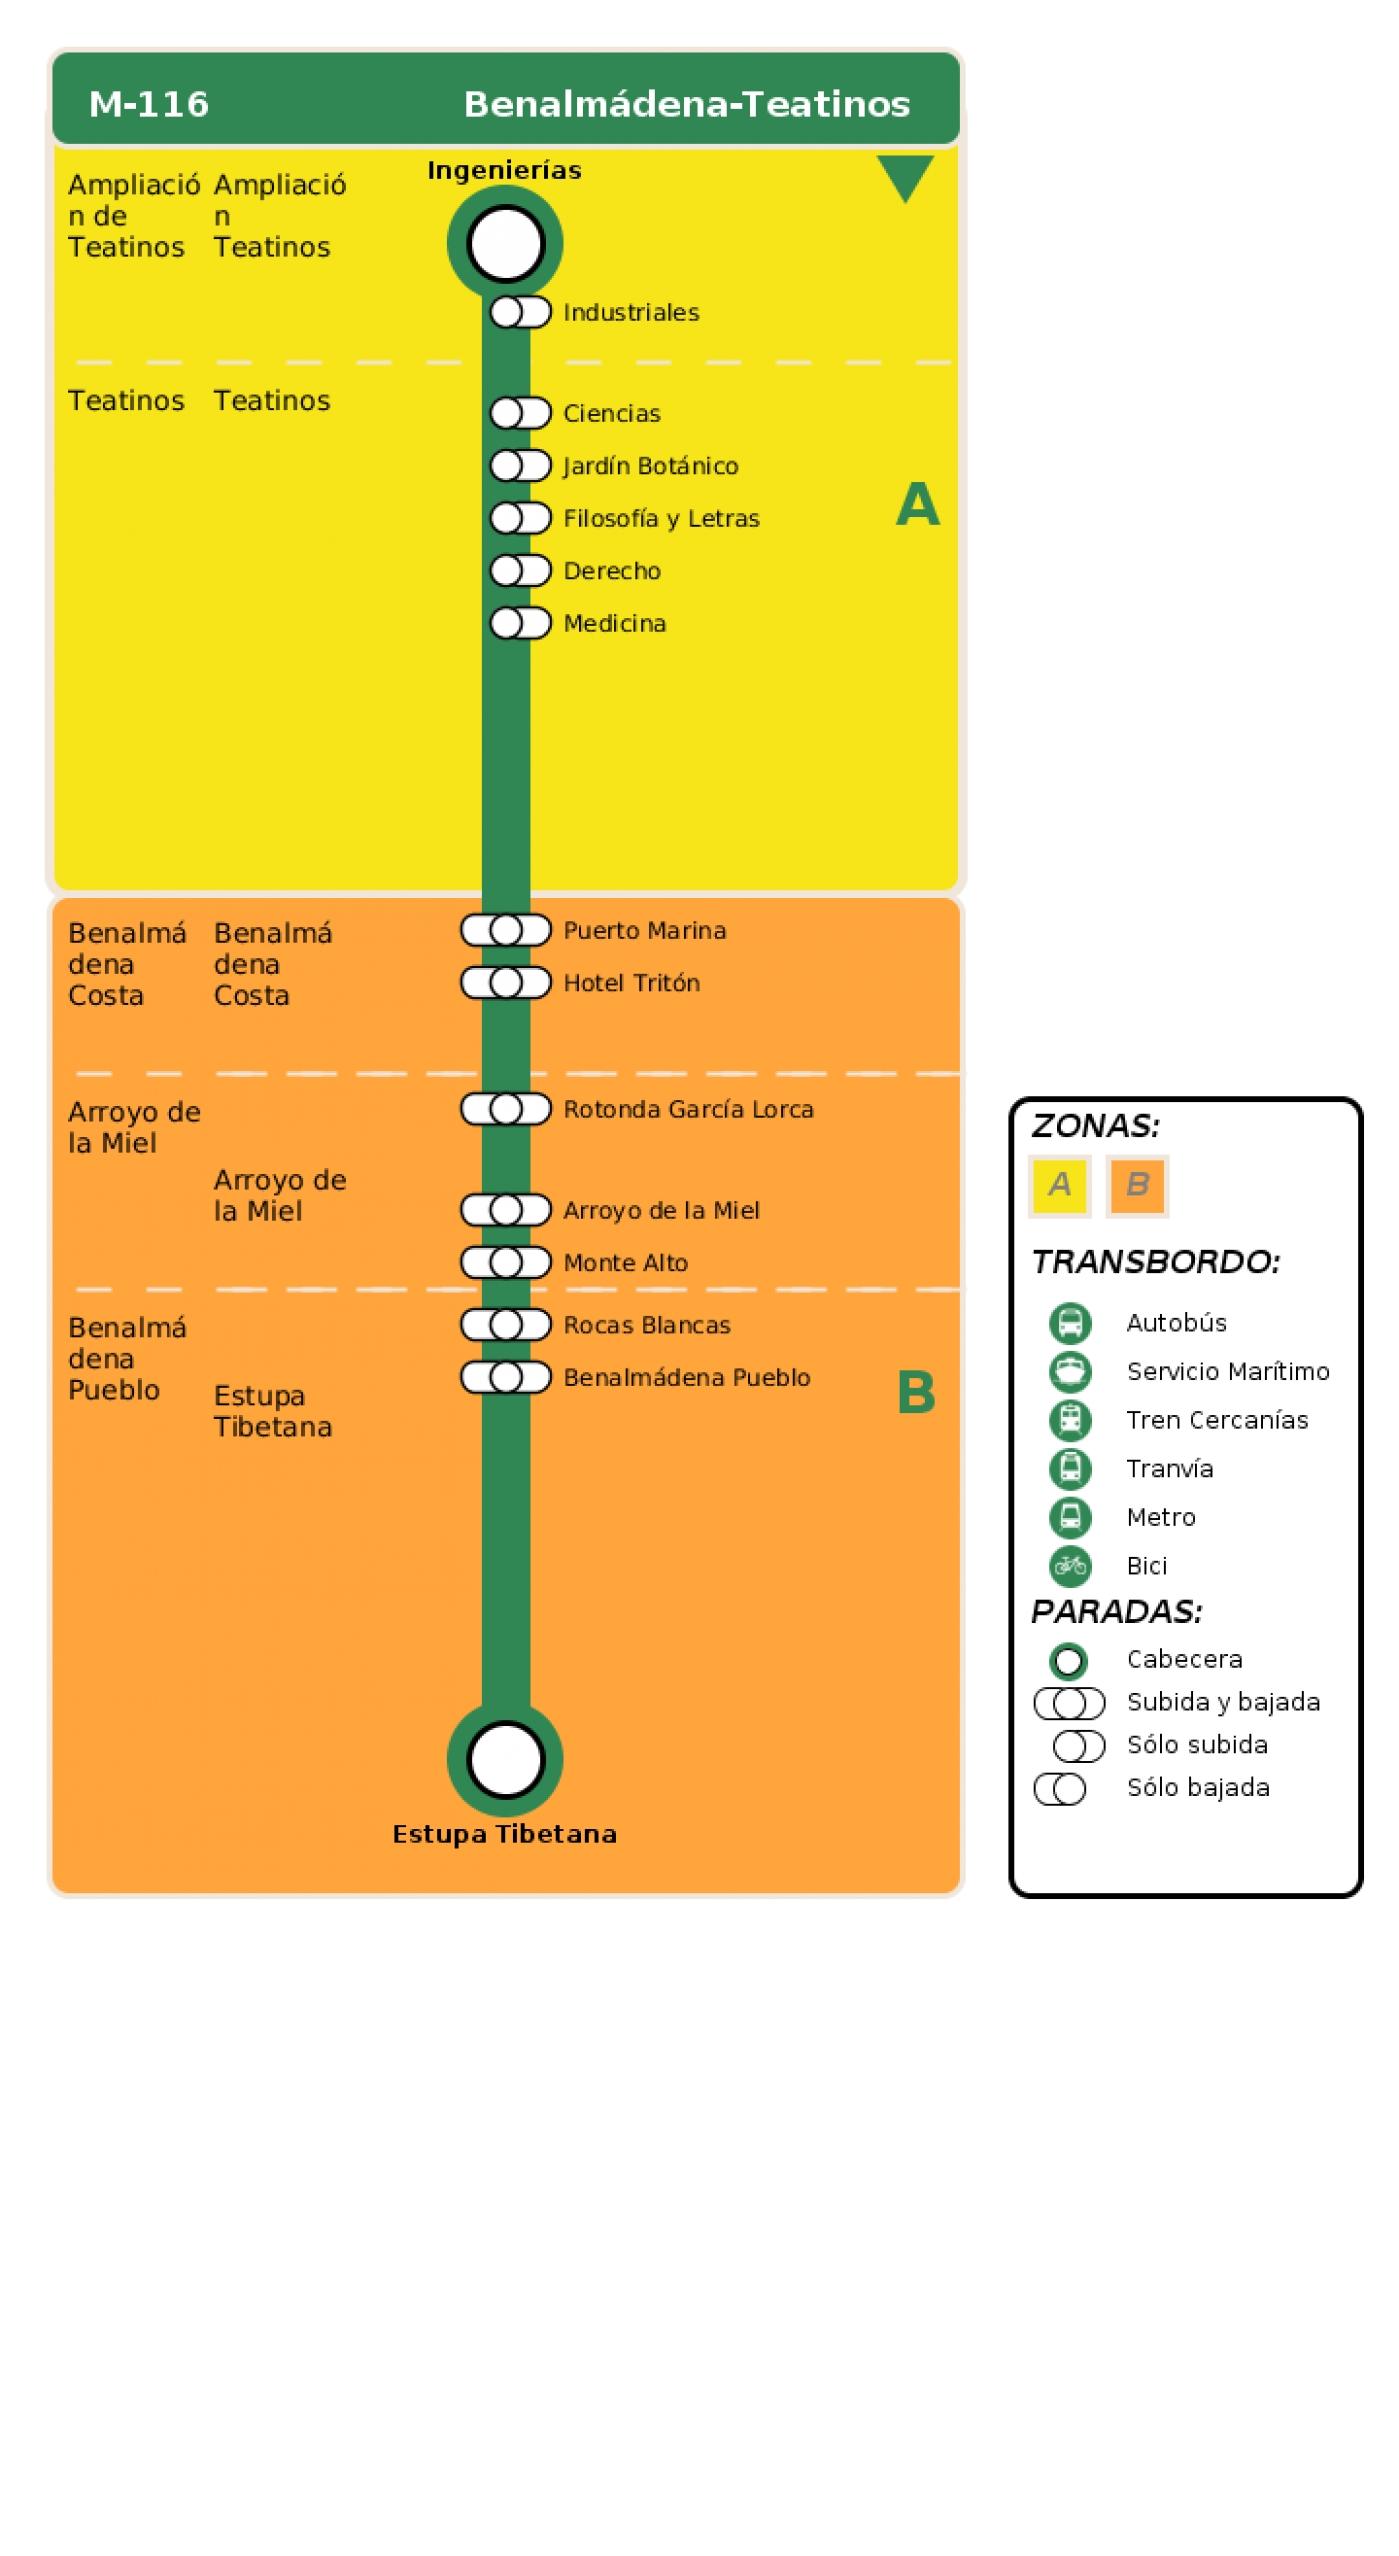 Recorrido esquemático, paradas y correspondencias en sentido vuelta Línea M-116: Benalmádena - Teatinos